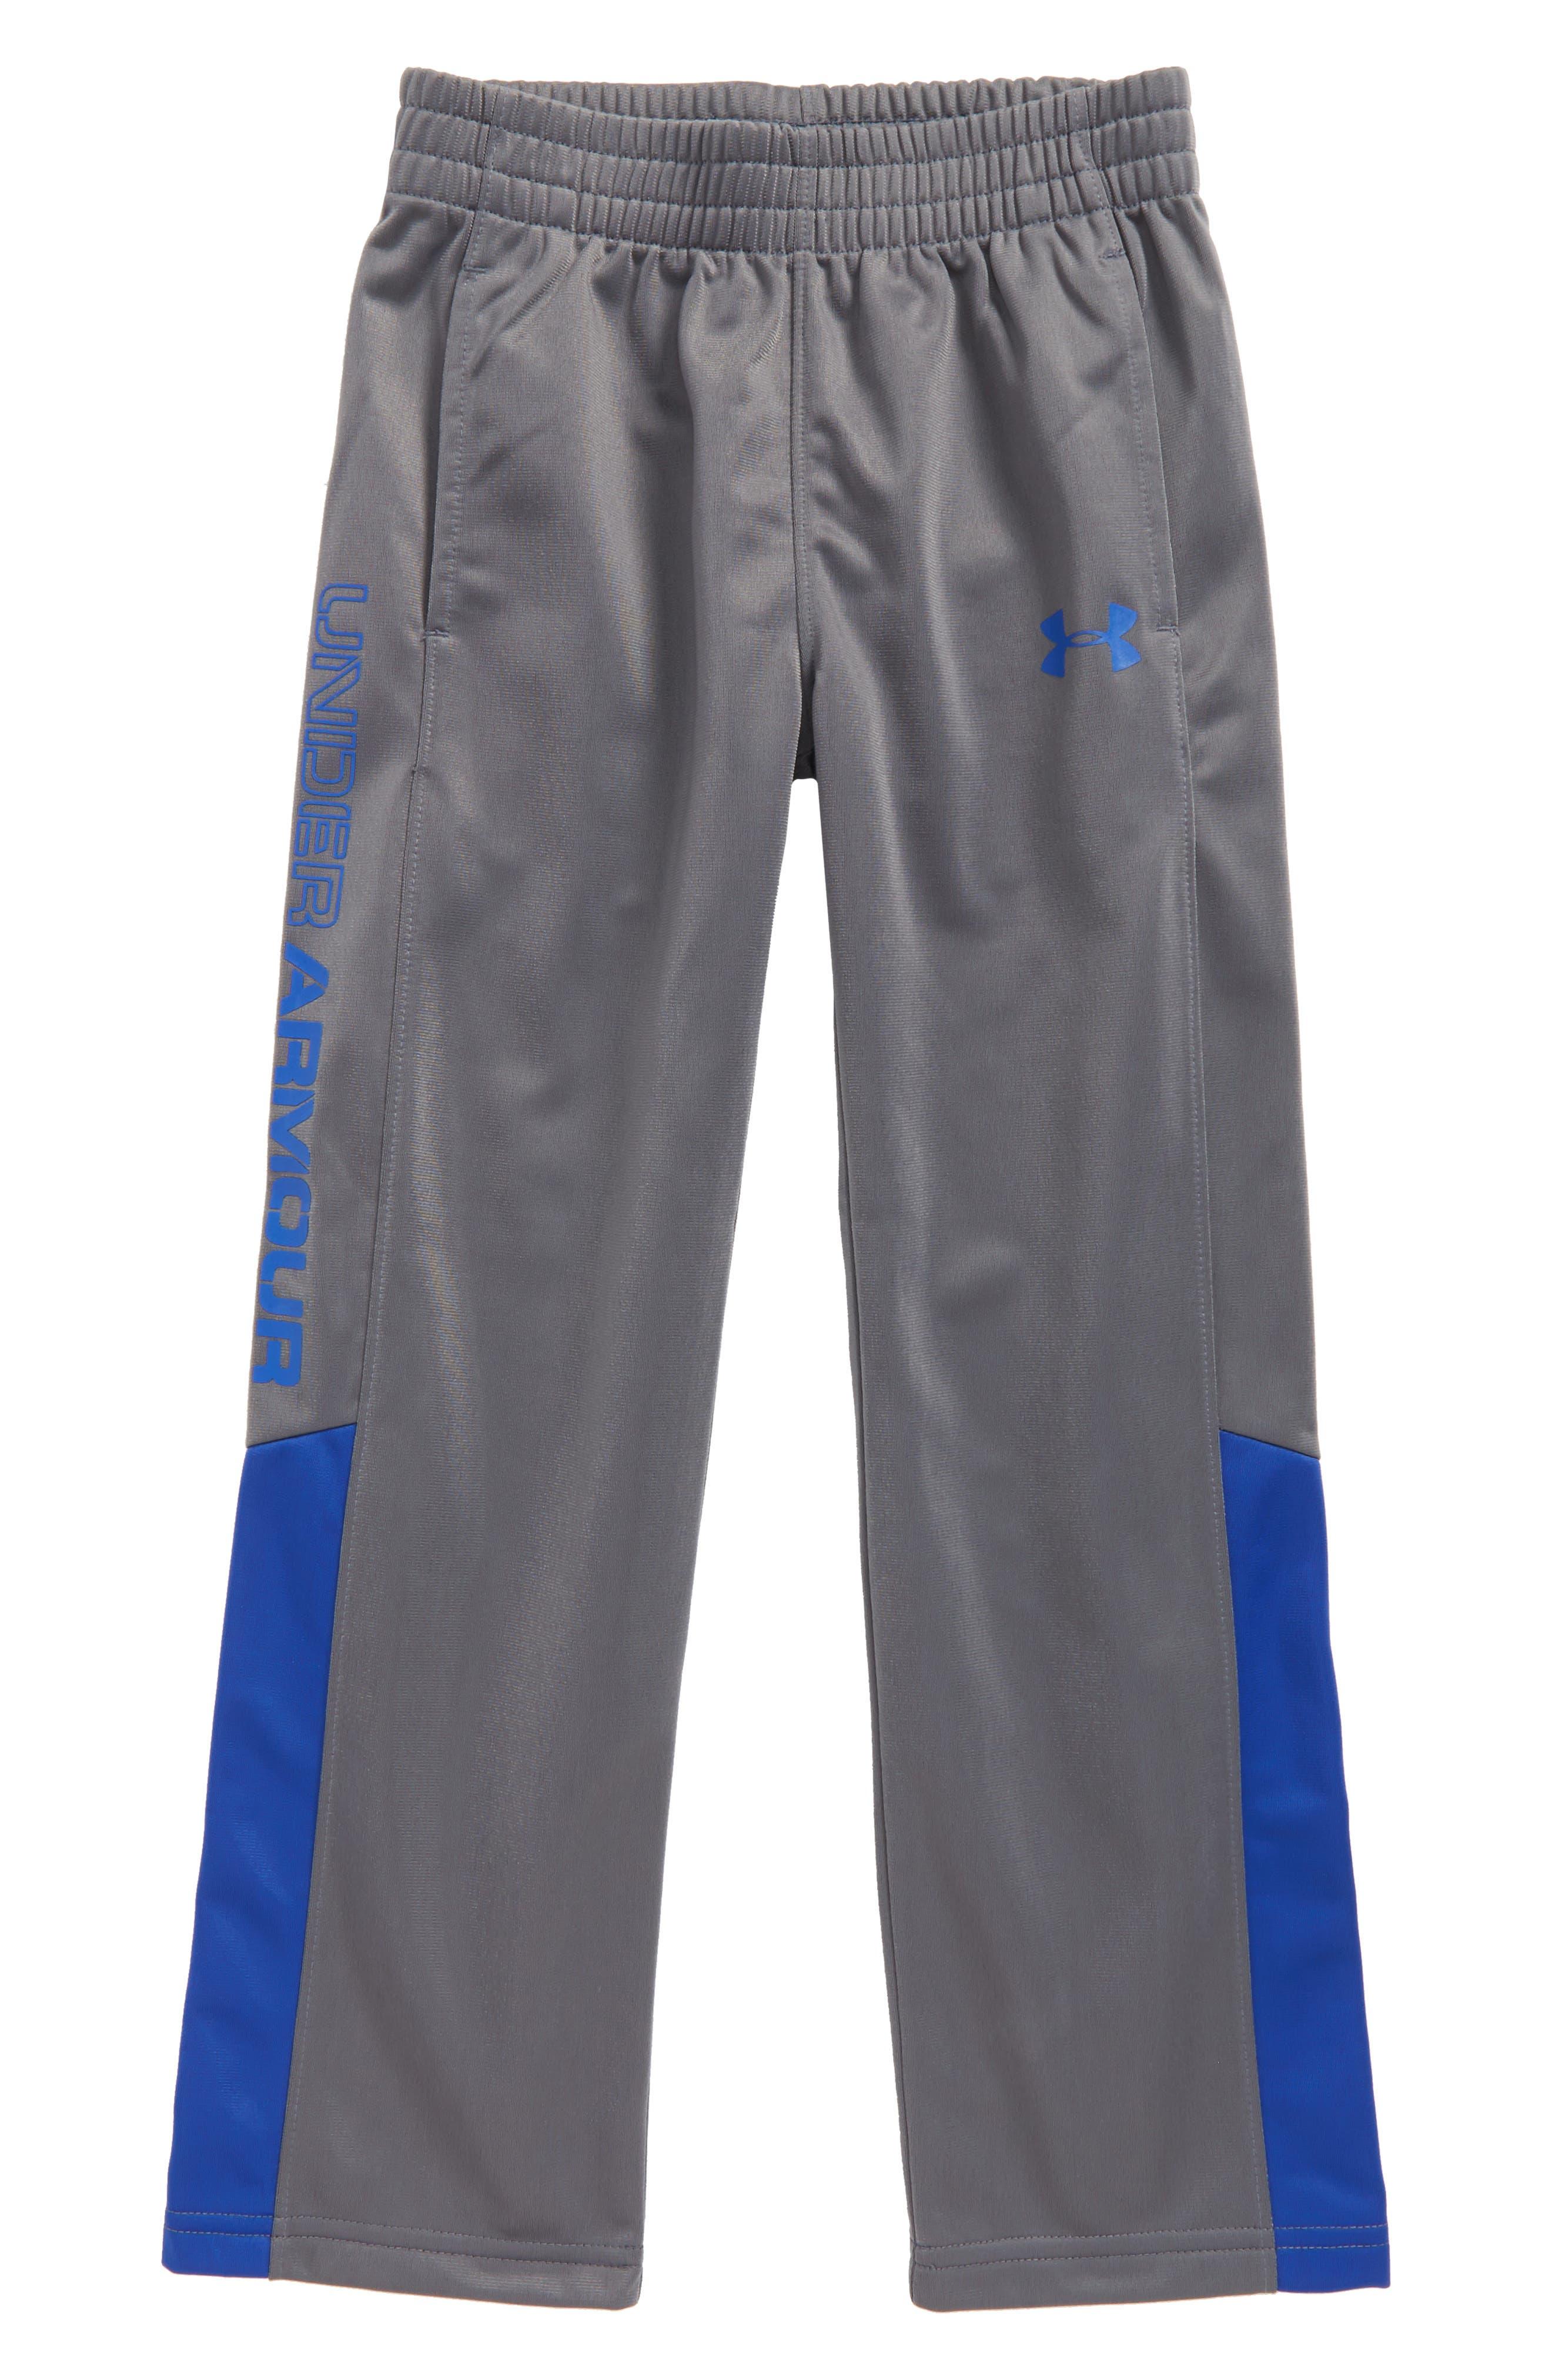 Brawler 2.0 Pants,                             Main thumbnail 1, color,                             Graphite/ Royal